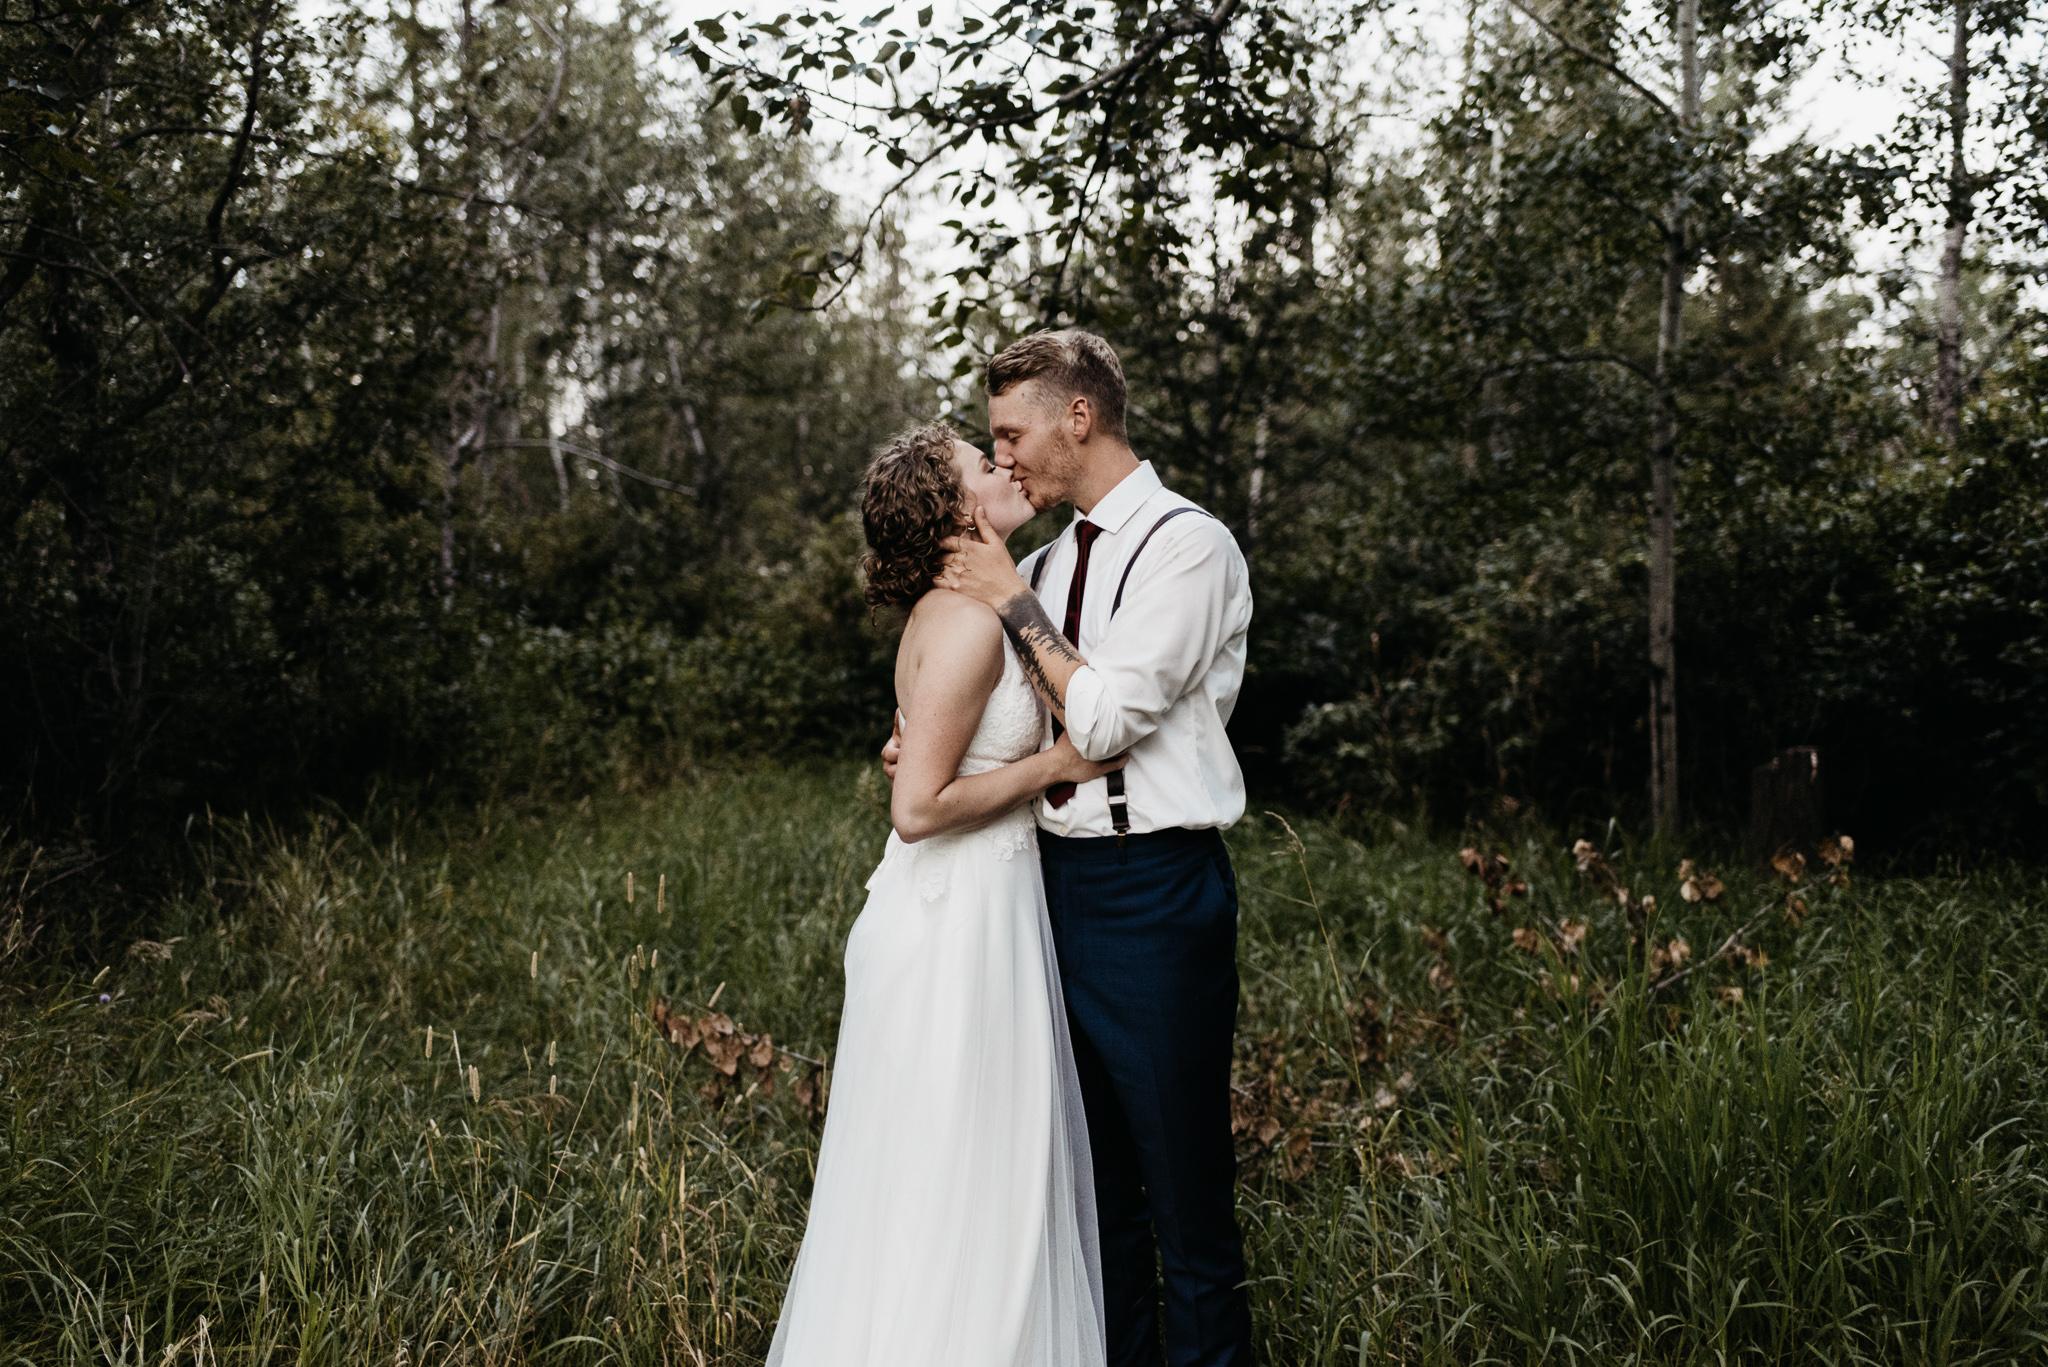 J&C-Weddingblog-107.jpg